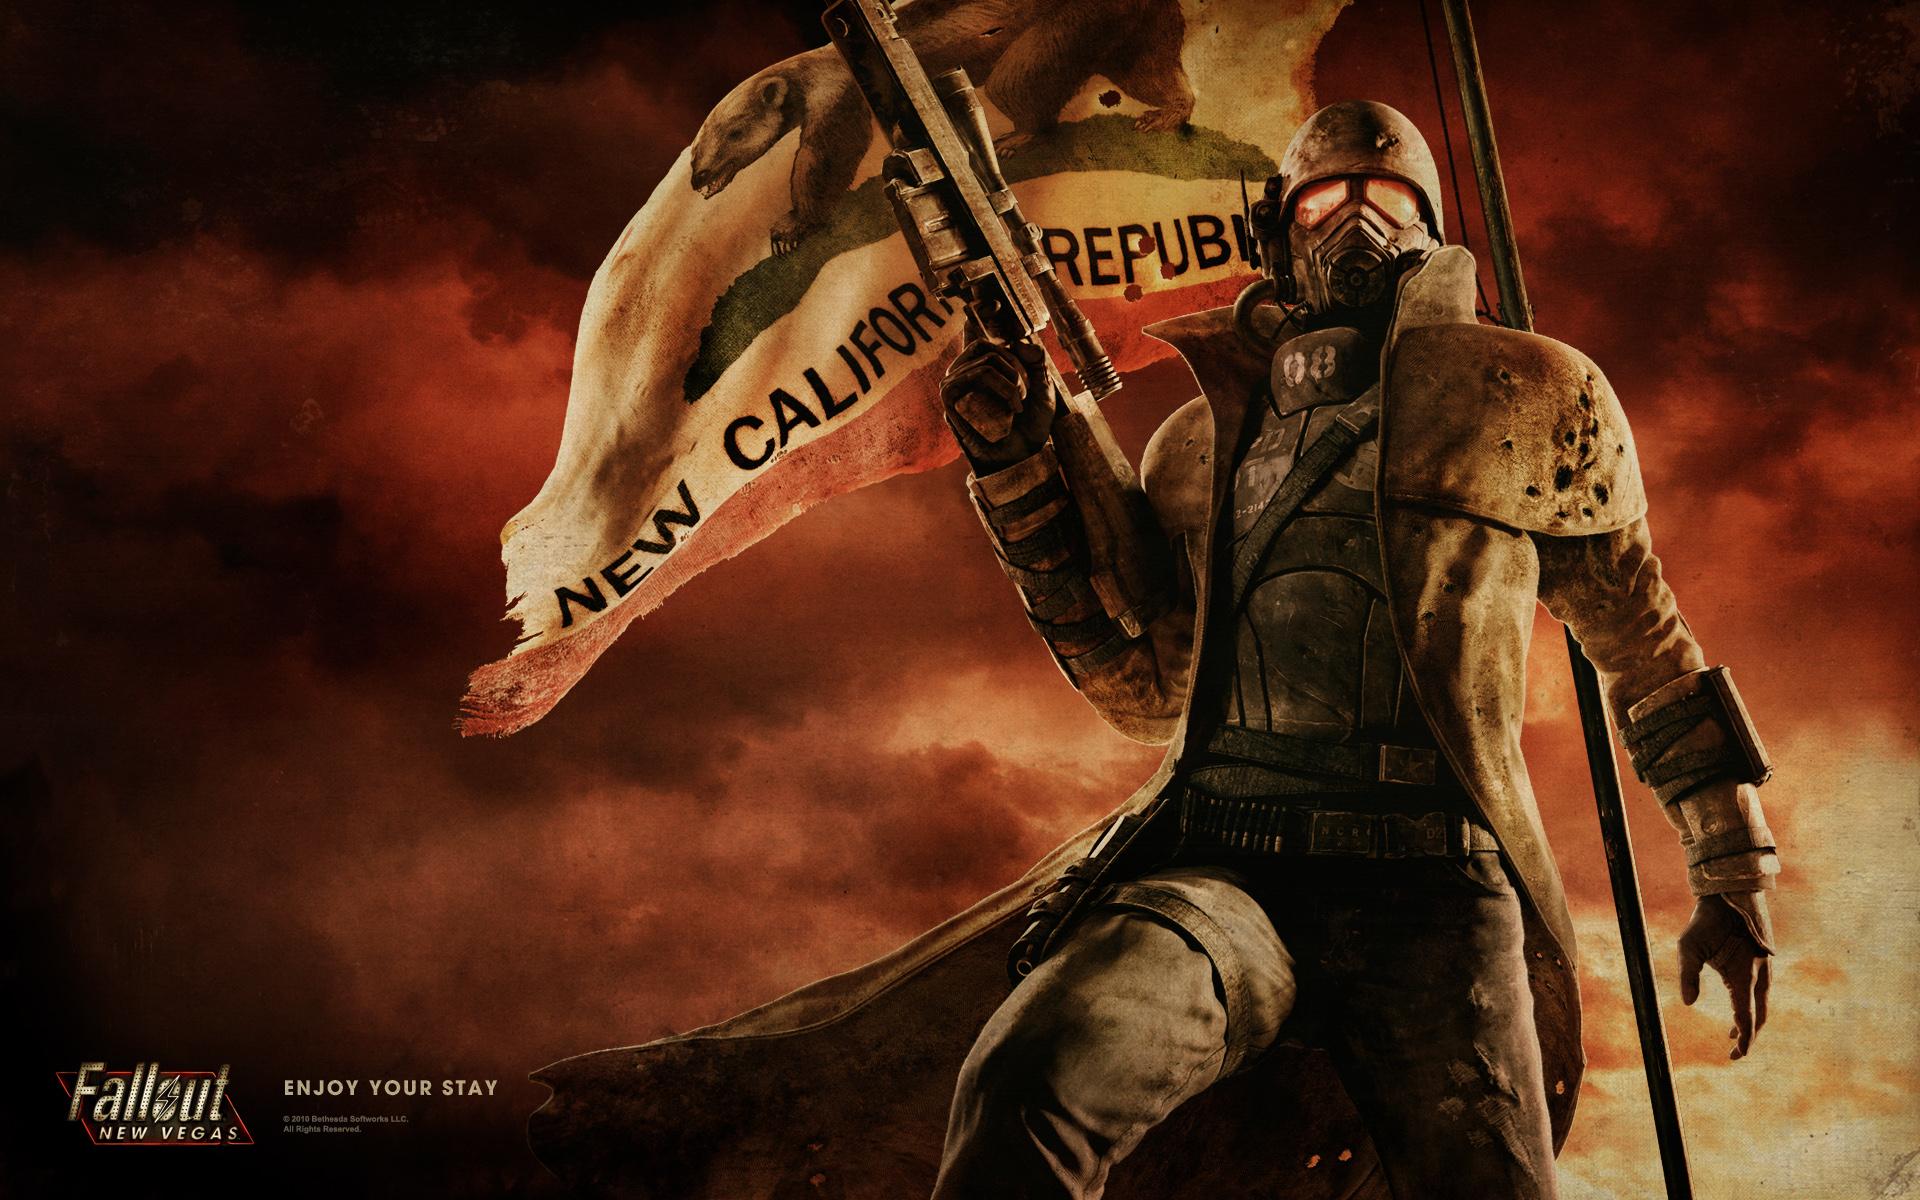 fallout4 new vegas 画像 fallout new vegas wallaper 3 hd 壁紙 and